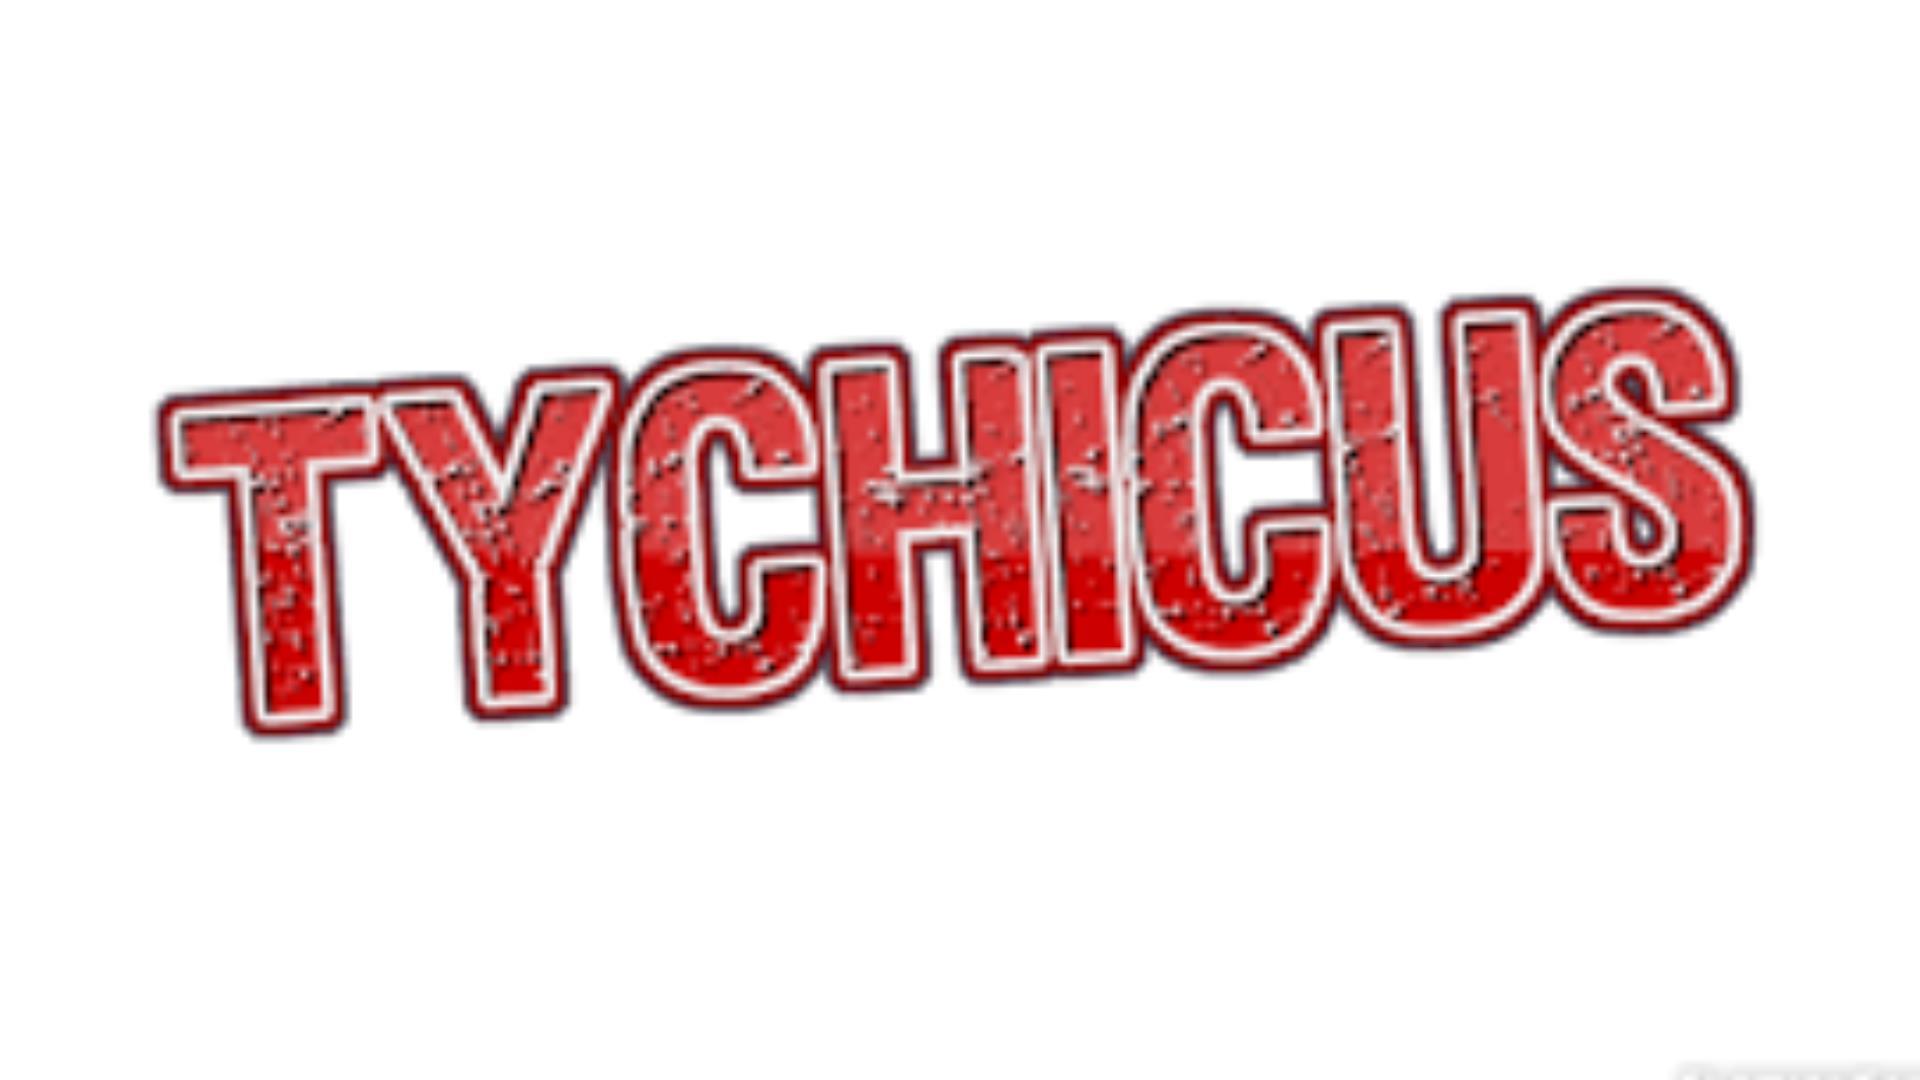 TYCHICUS